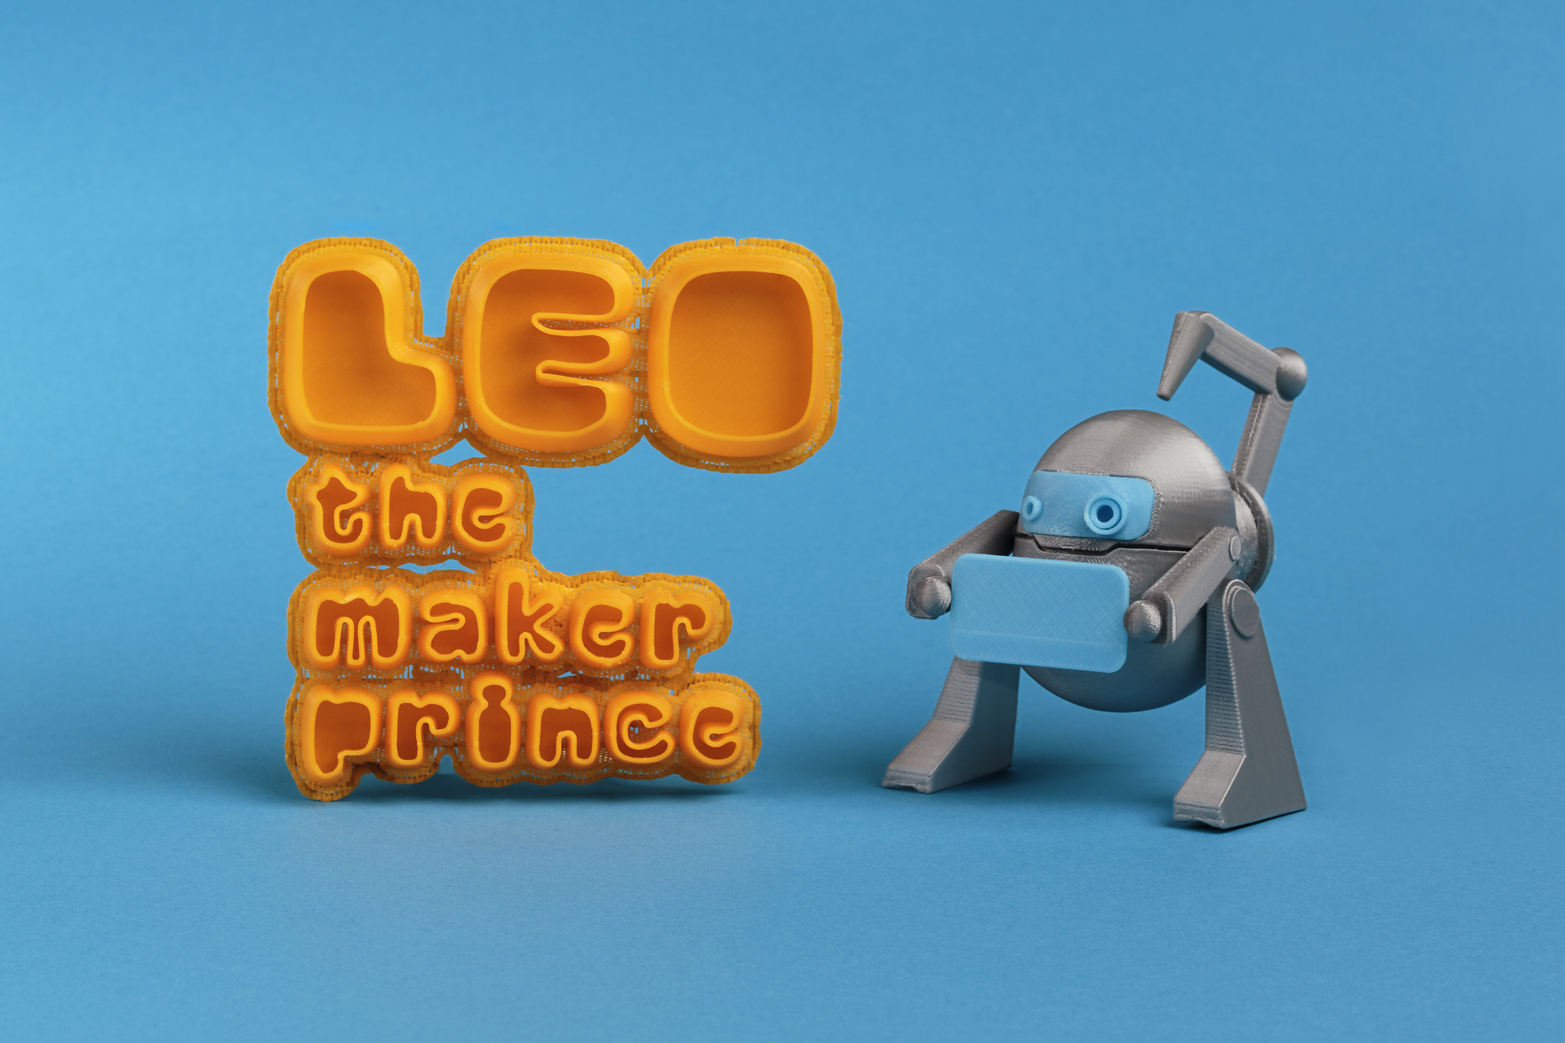 LEO, The Maker Prince (Photo courtesy Carla Diana)